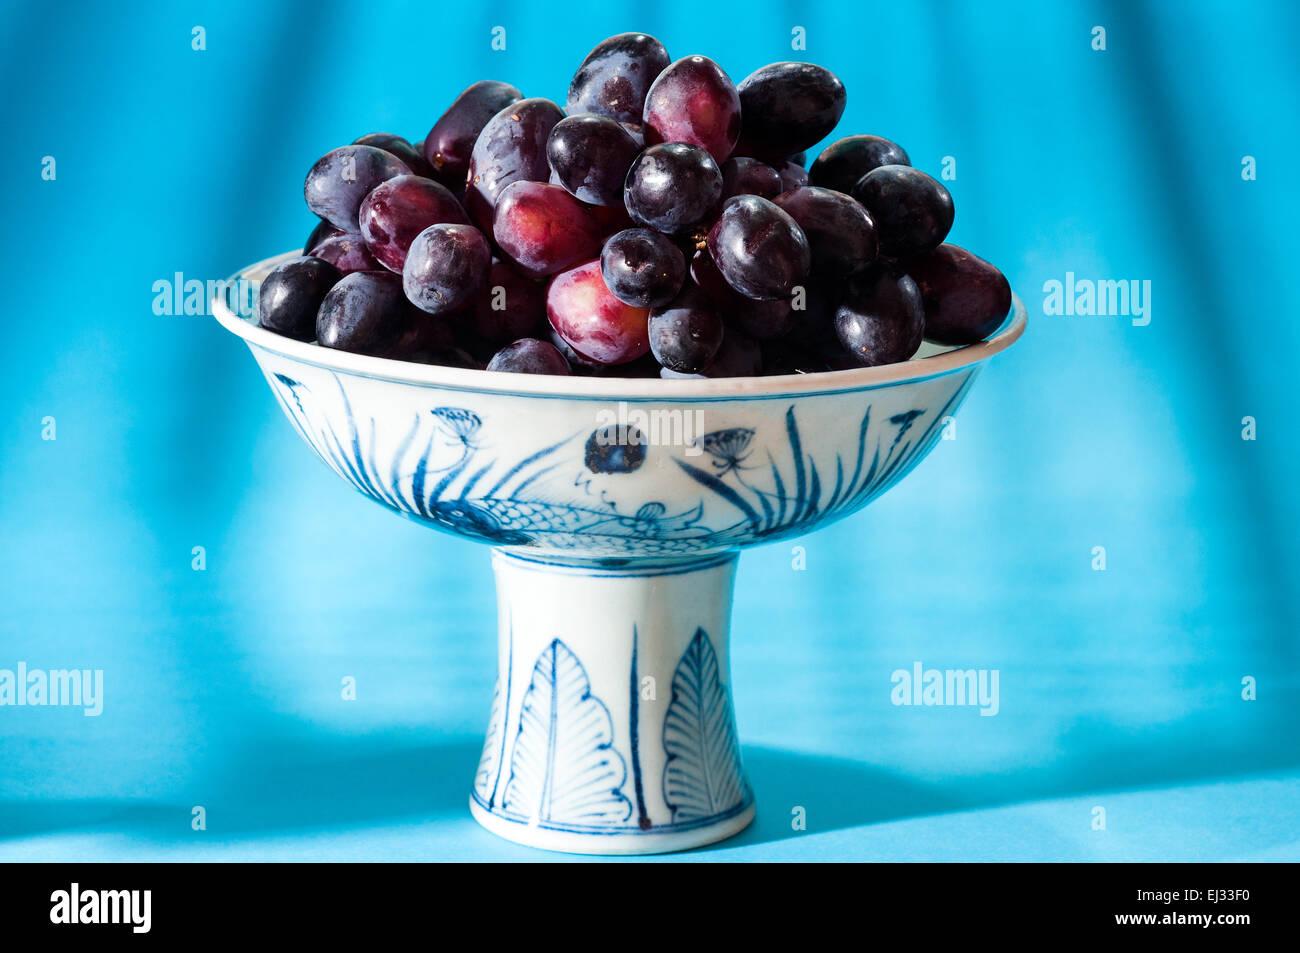 Ming Bowl Stock Photos & Ming Bowl Stock Images - Alamy